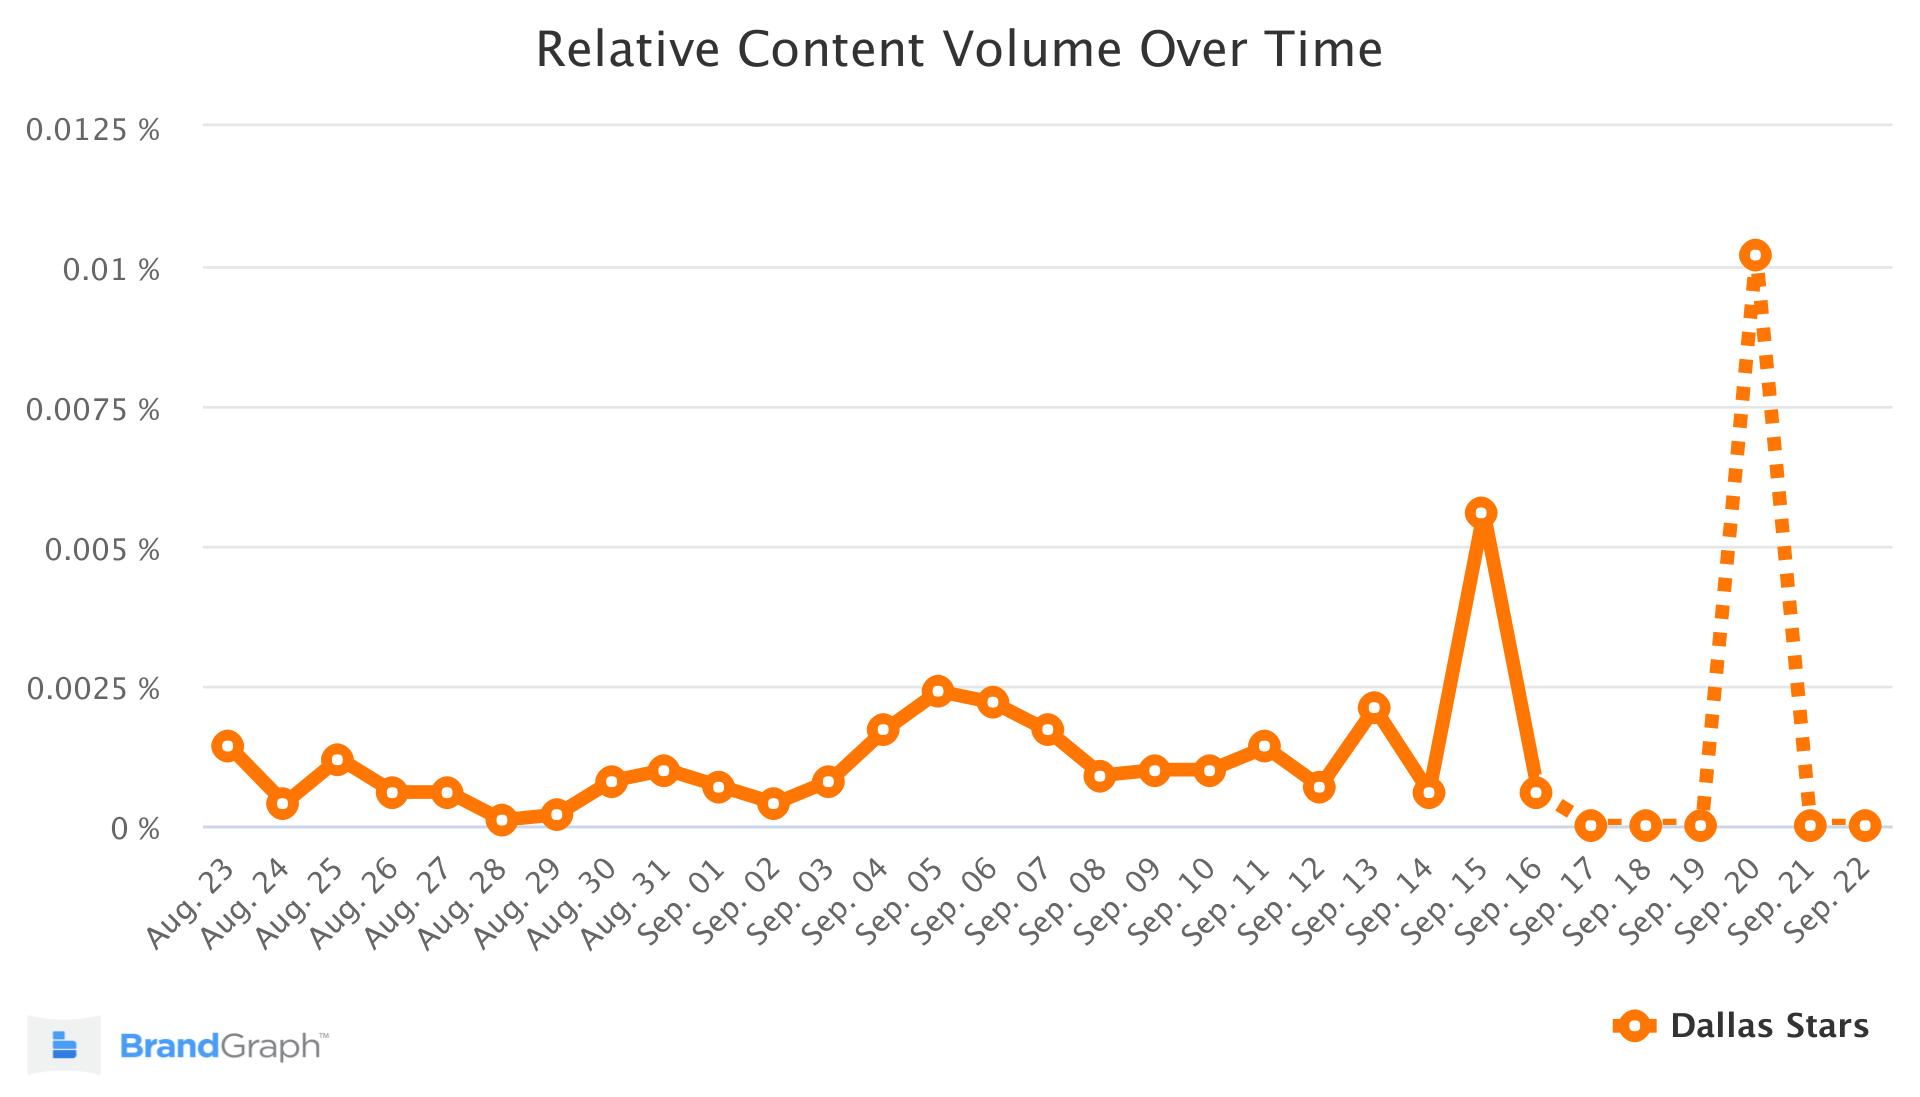 dallas stars brandgraph trend chart